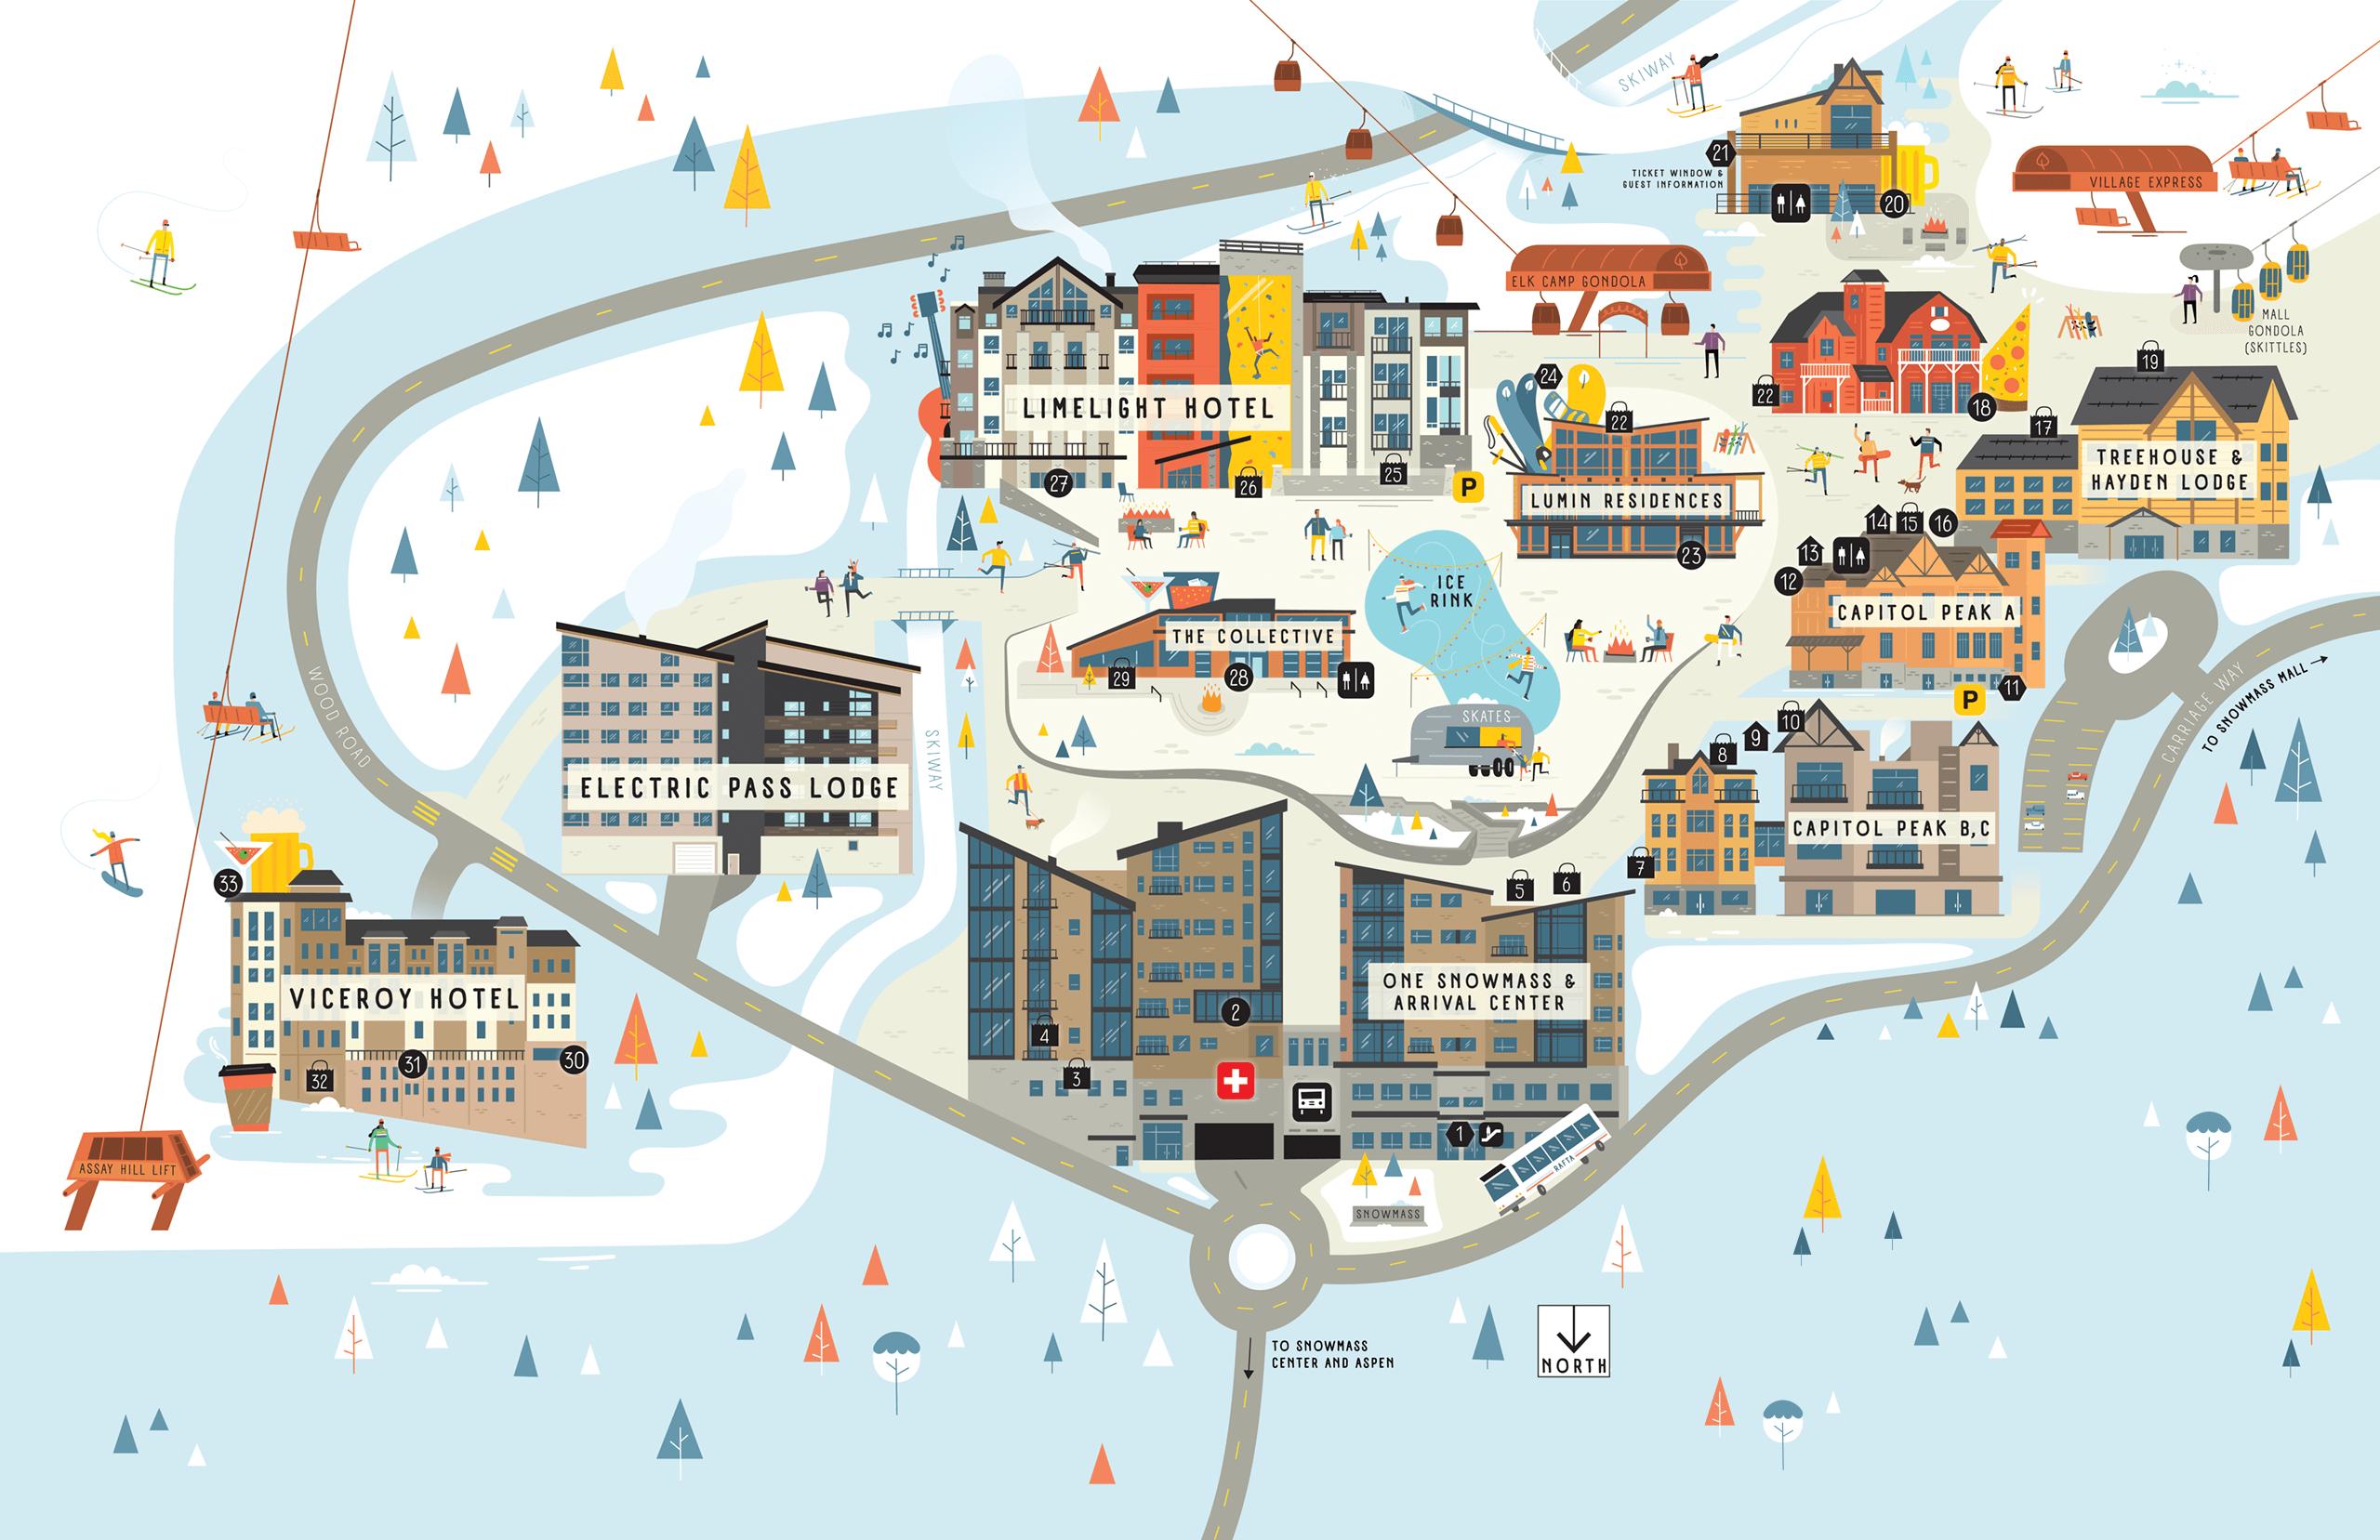 Snowmass Base Village Map